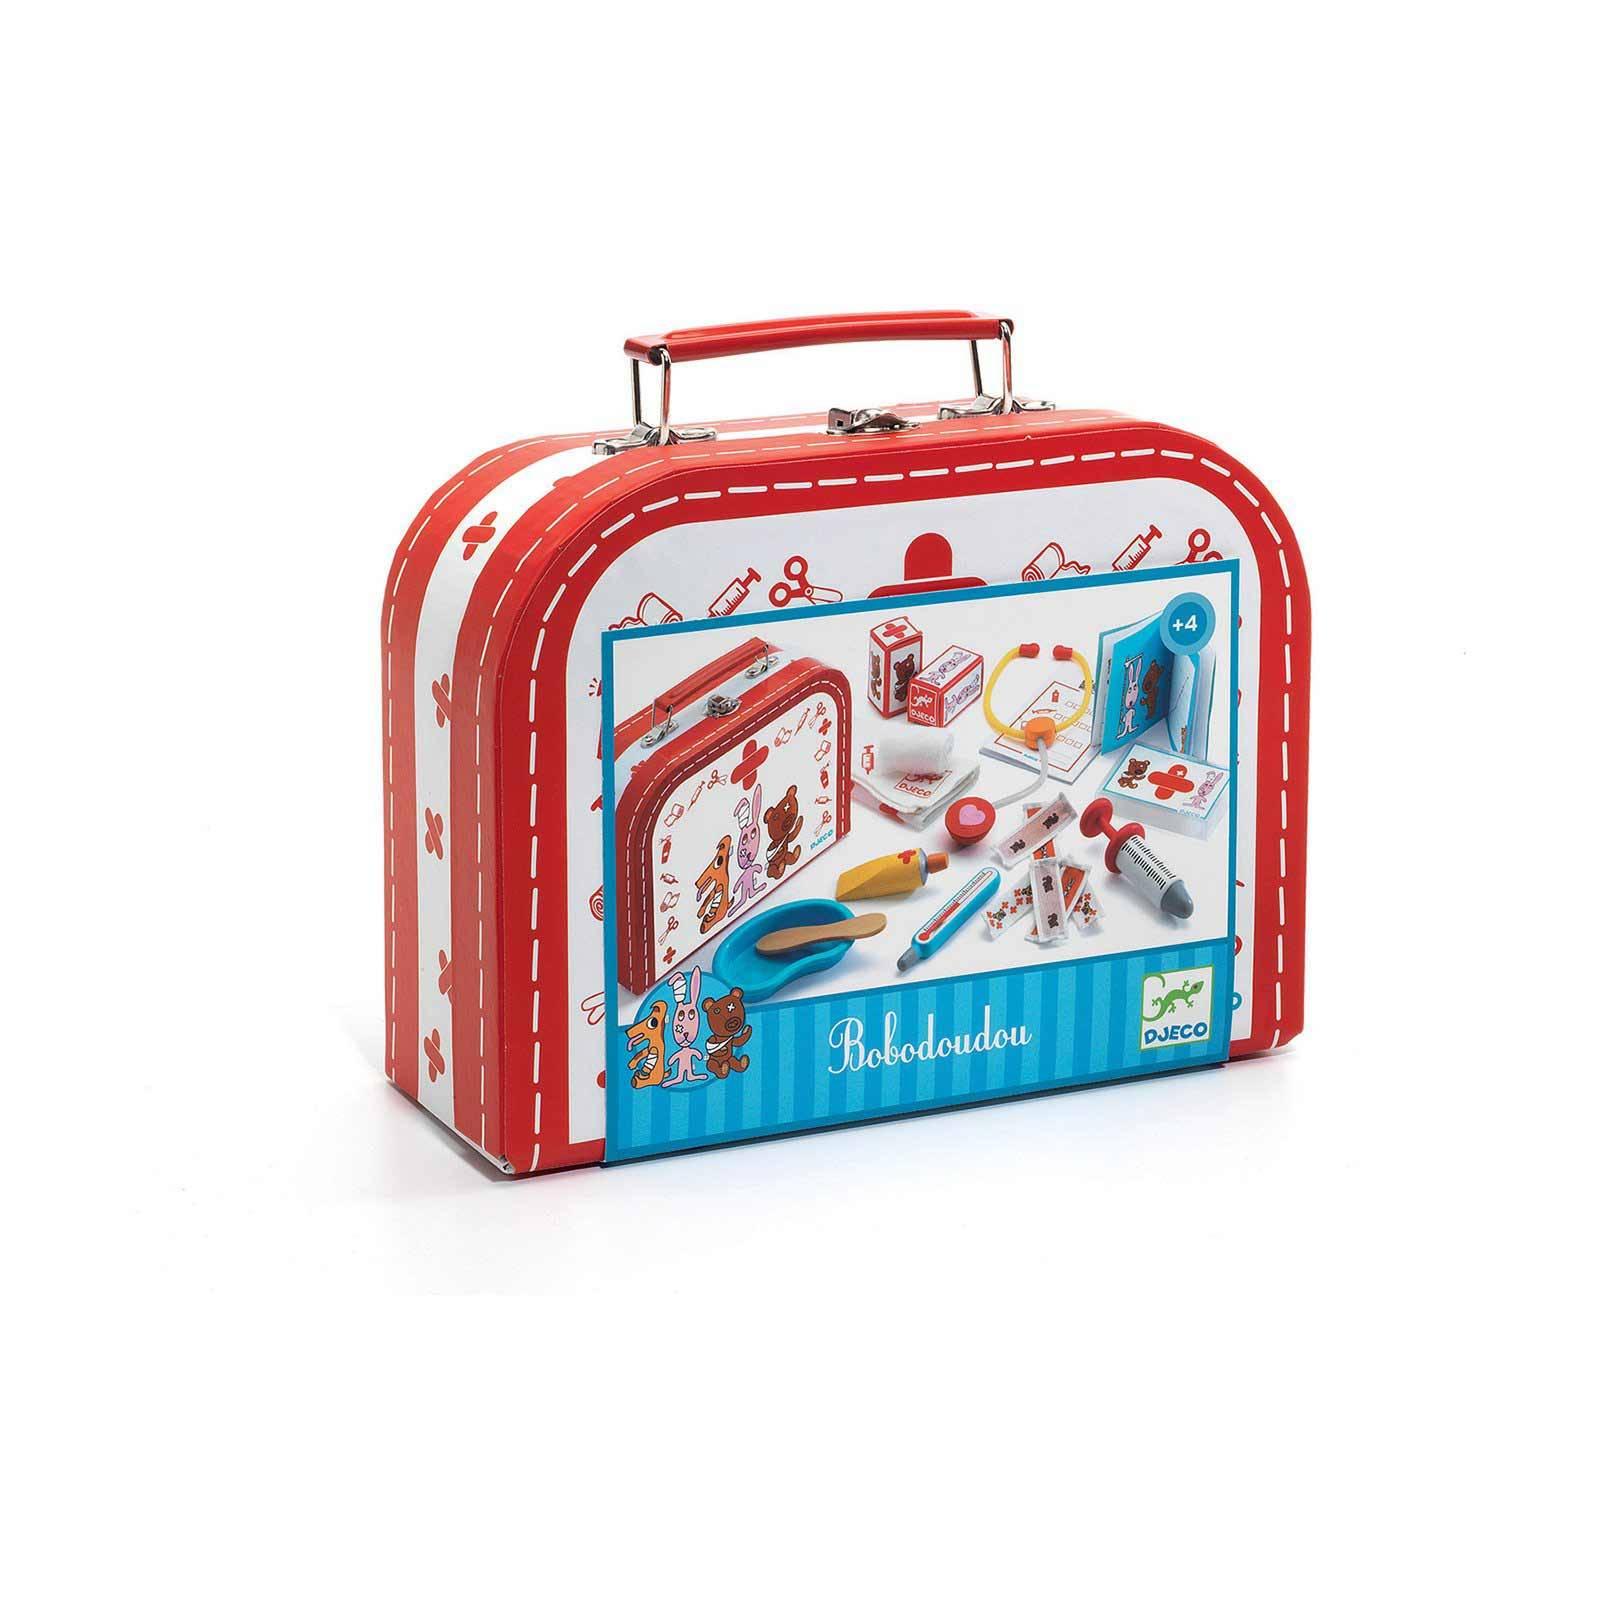 Bobodoudou: Suitcase Medical Vets Kit For Pets thumbnails